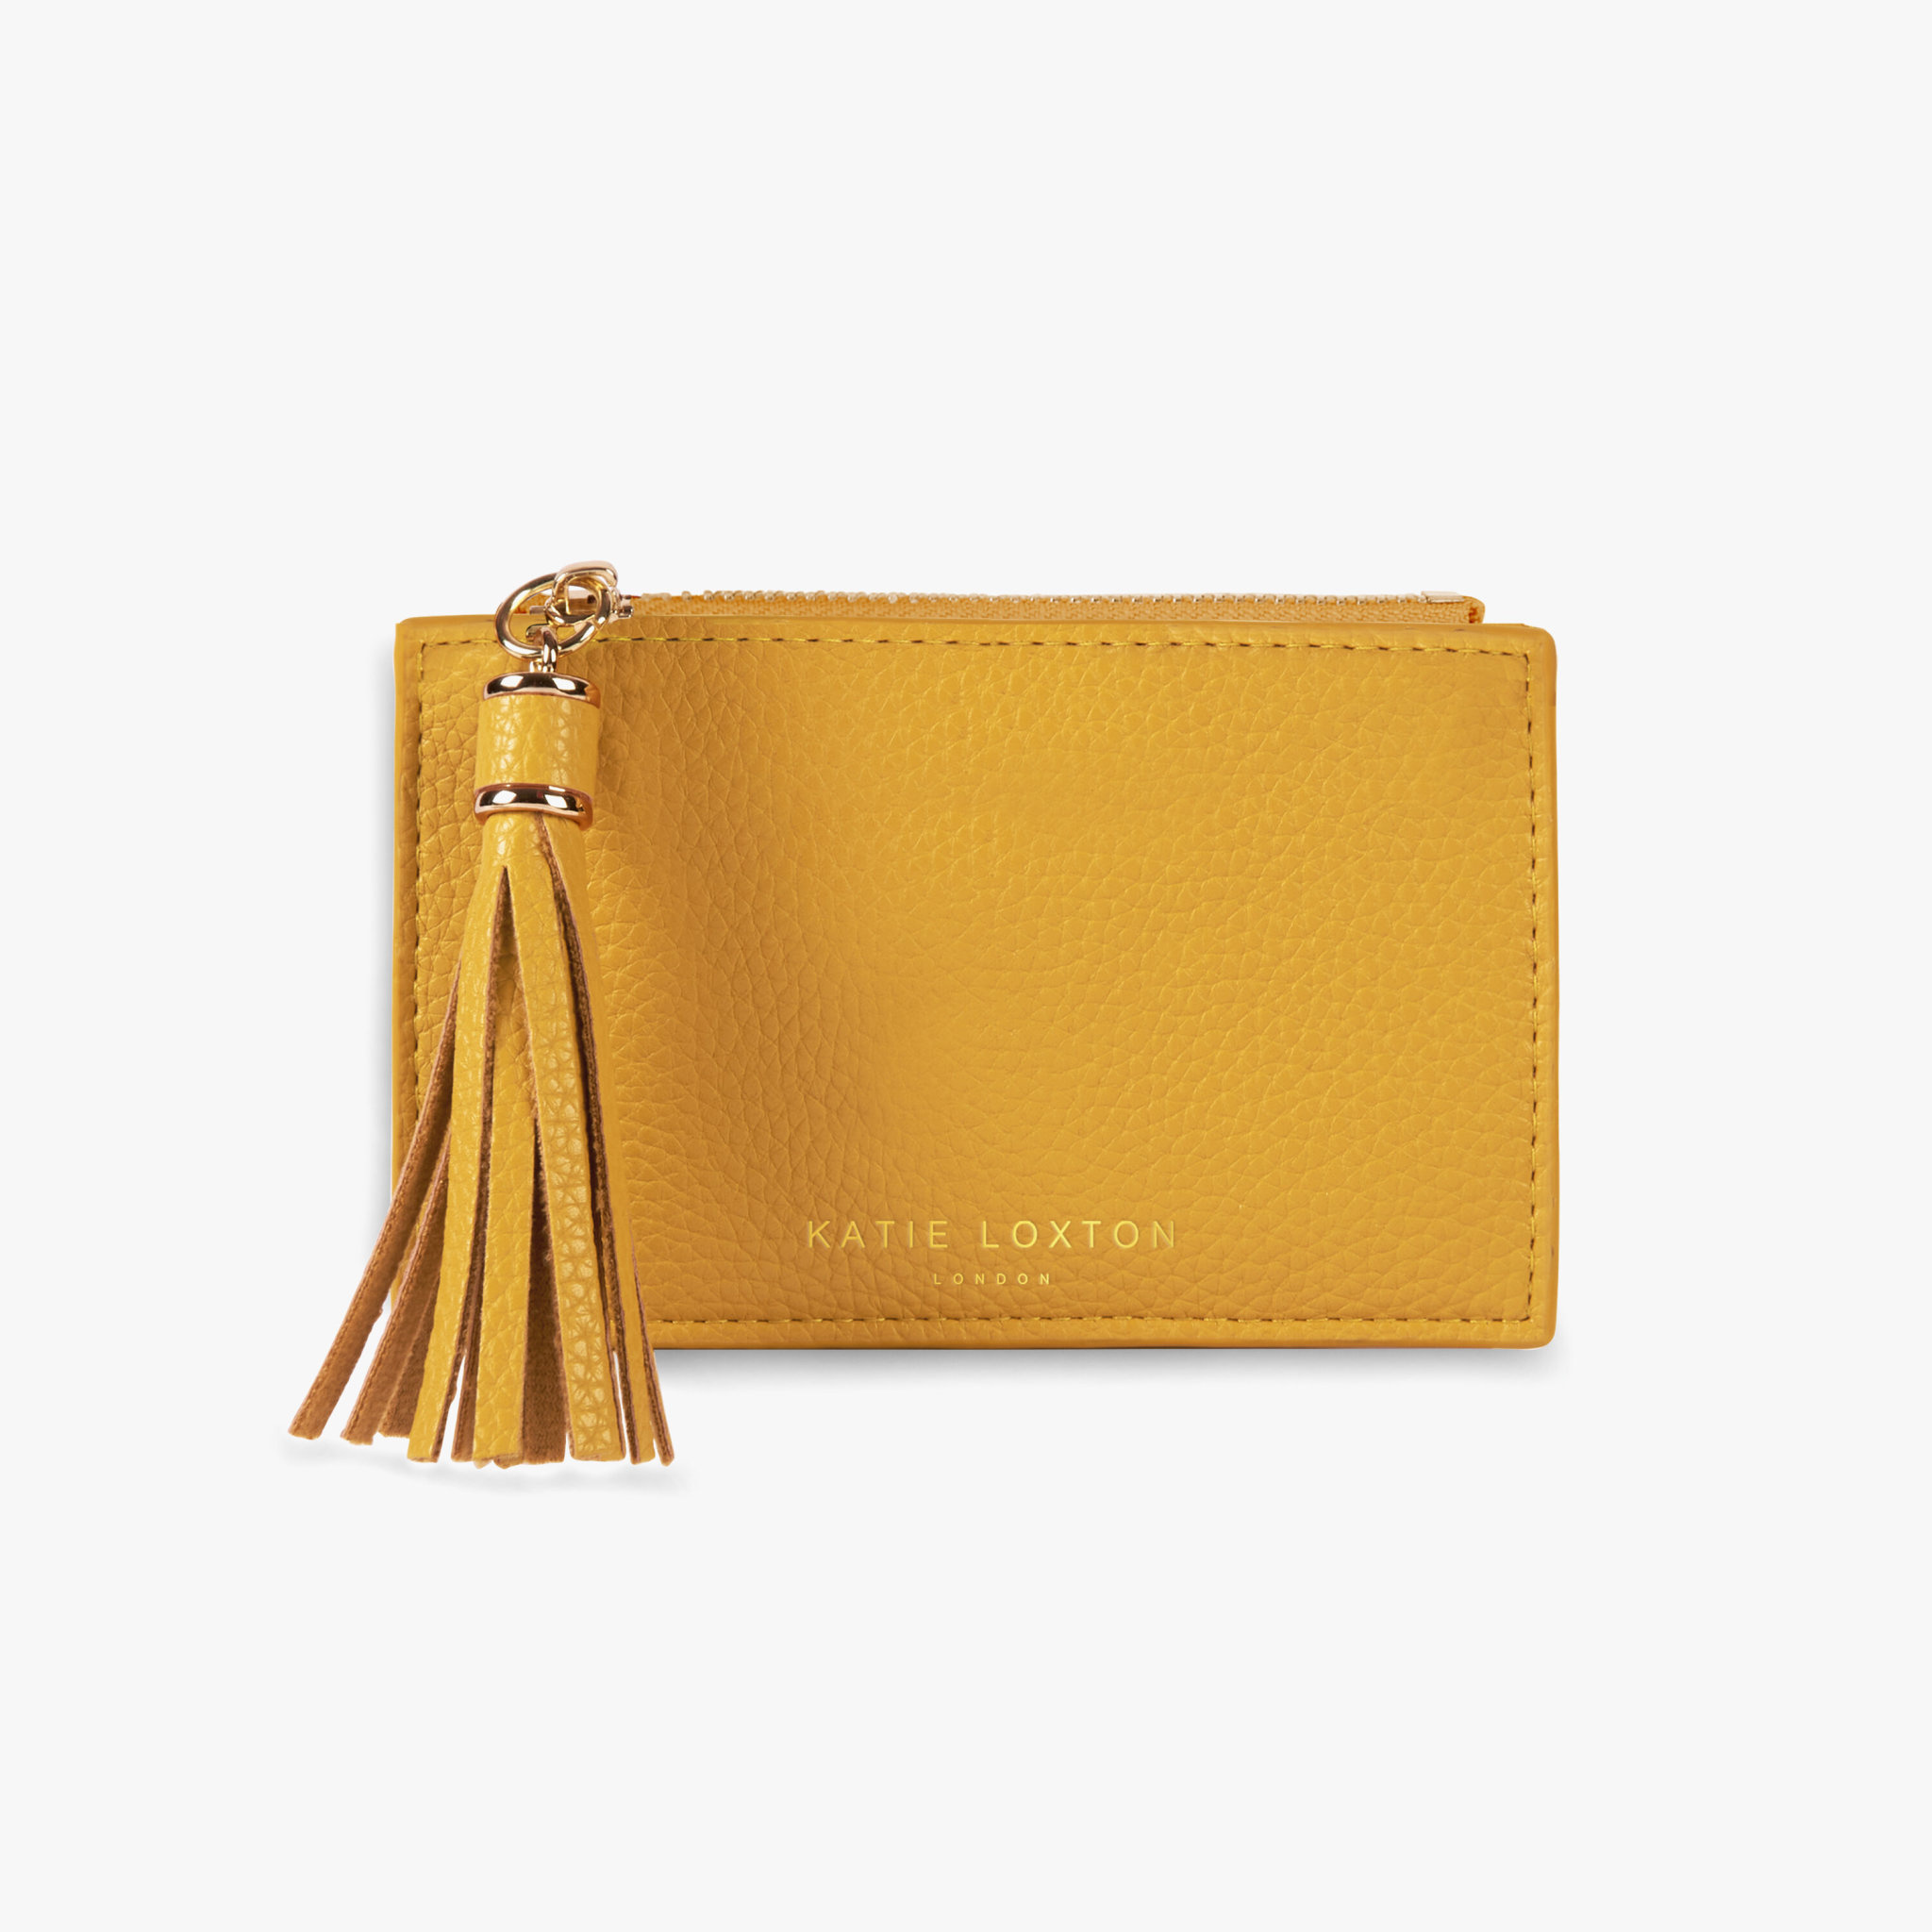 Katie Loxton Sophia tassel coin card purse - Ochre - 8.5 x 13.5 cm